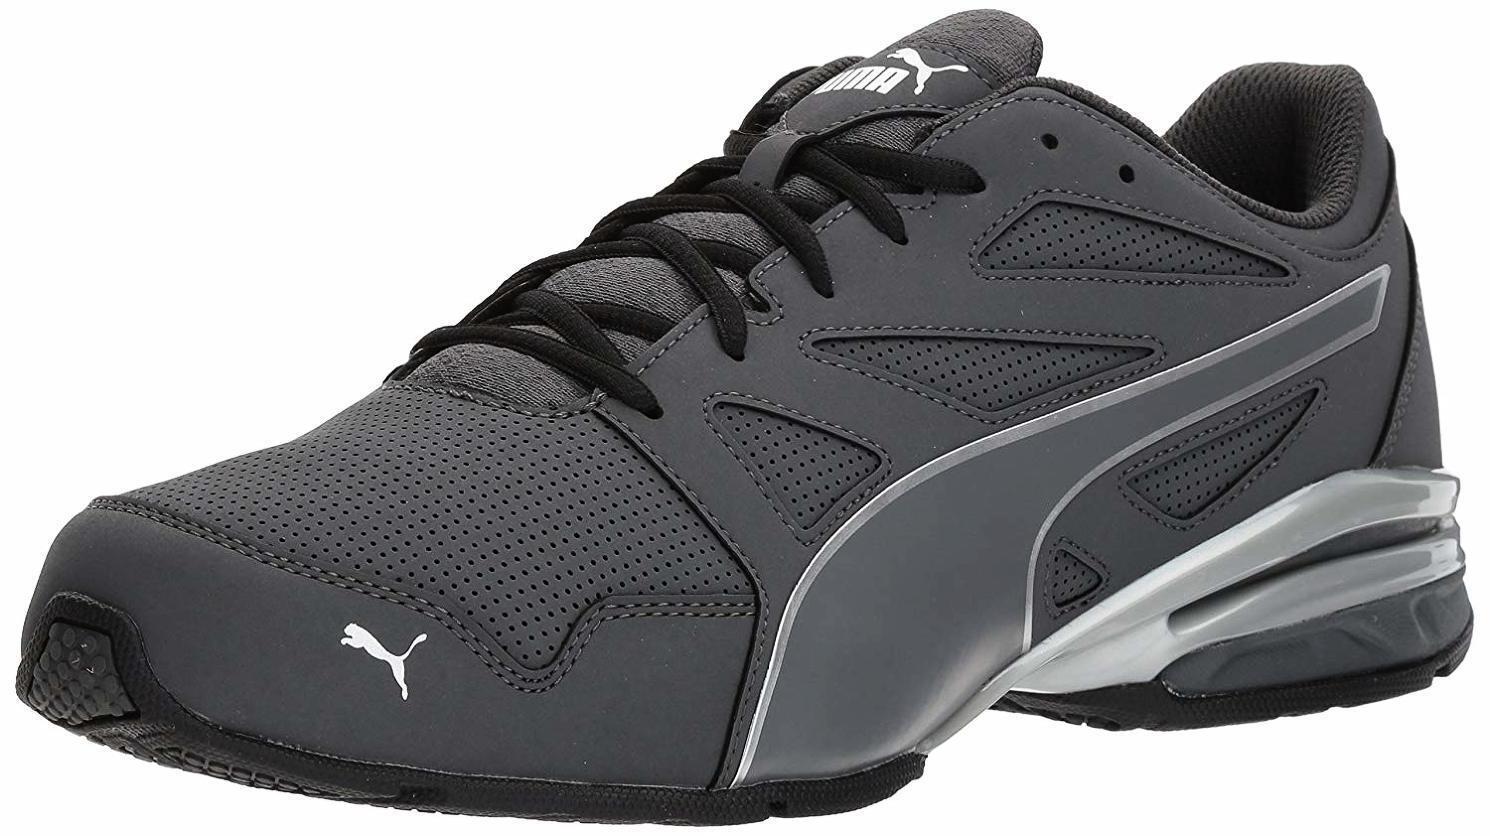 PUMA Men's Tazon Modern SL FM Sneaker - Choose SZ color